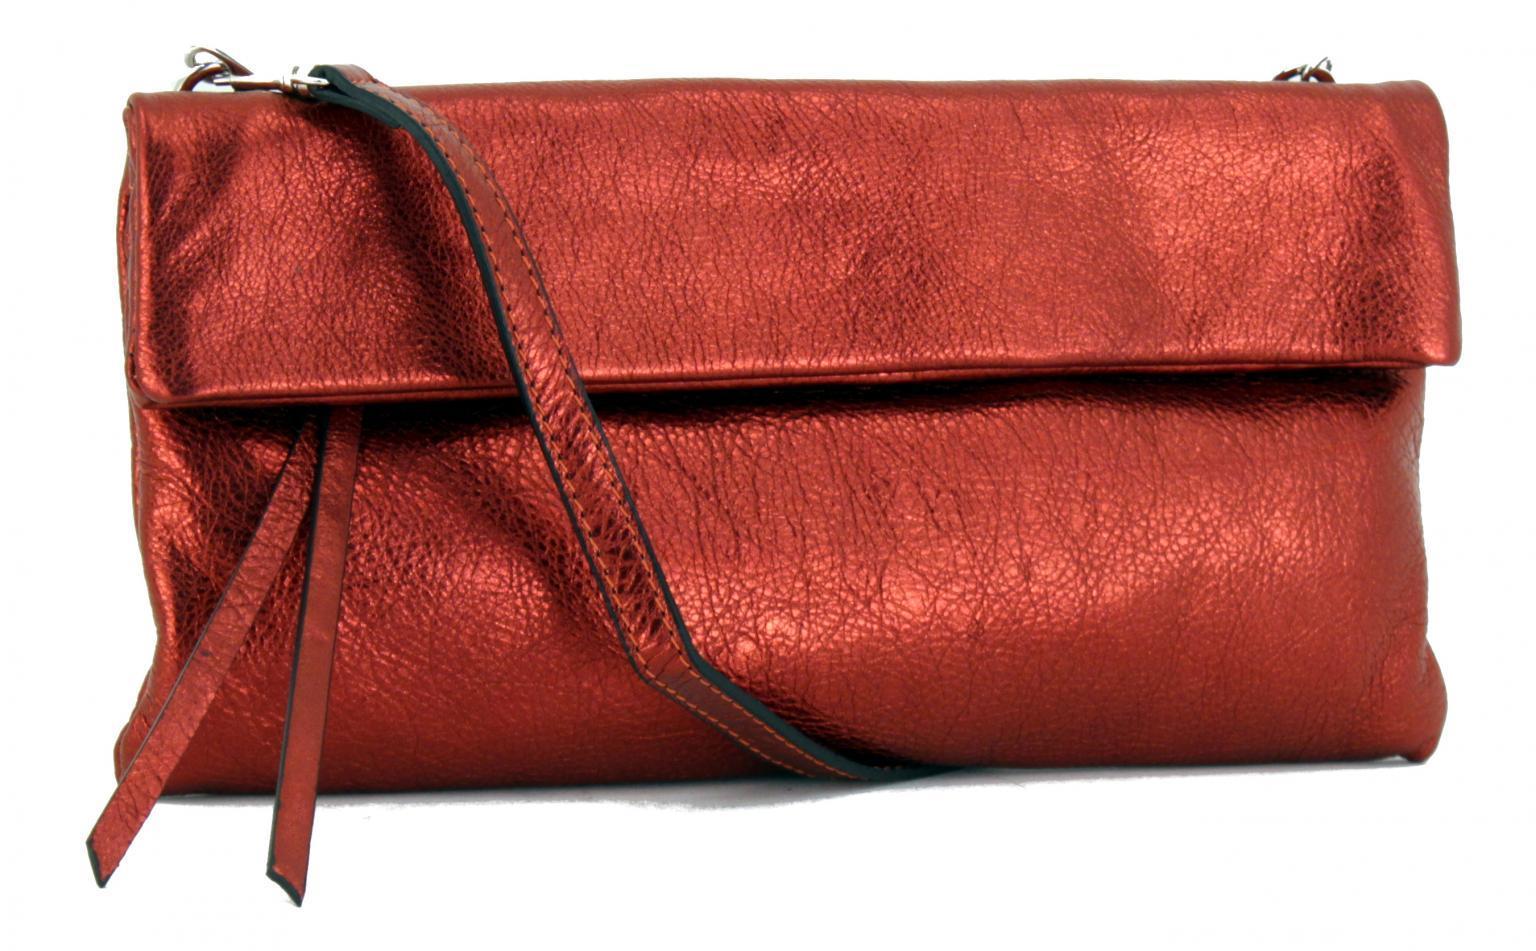 Gianni Chiarini Clutch Cherry Paprika rot metallic glänzend